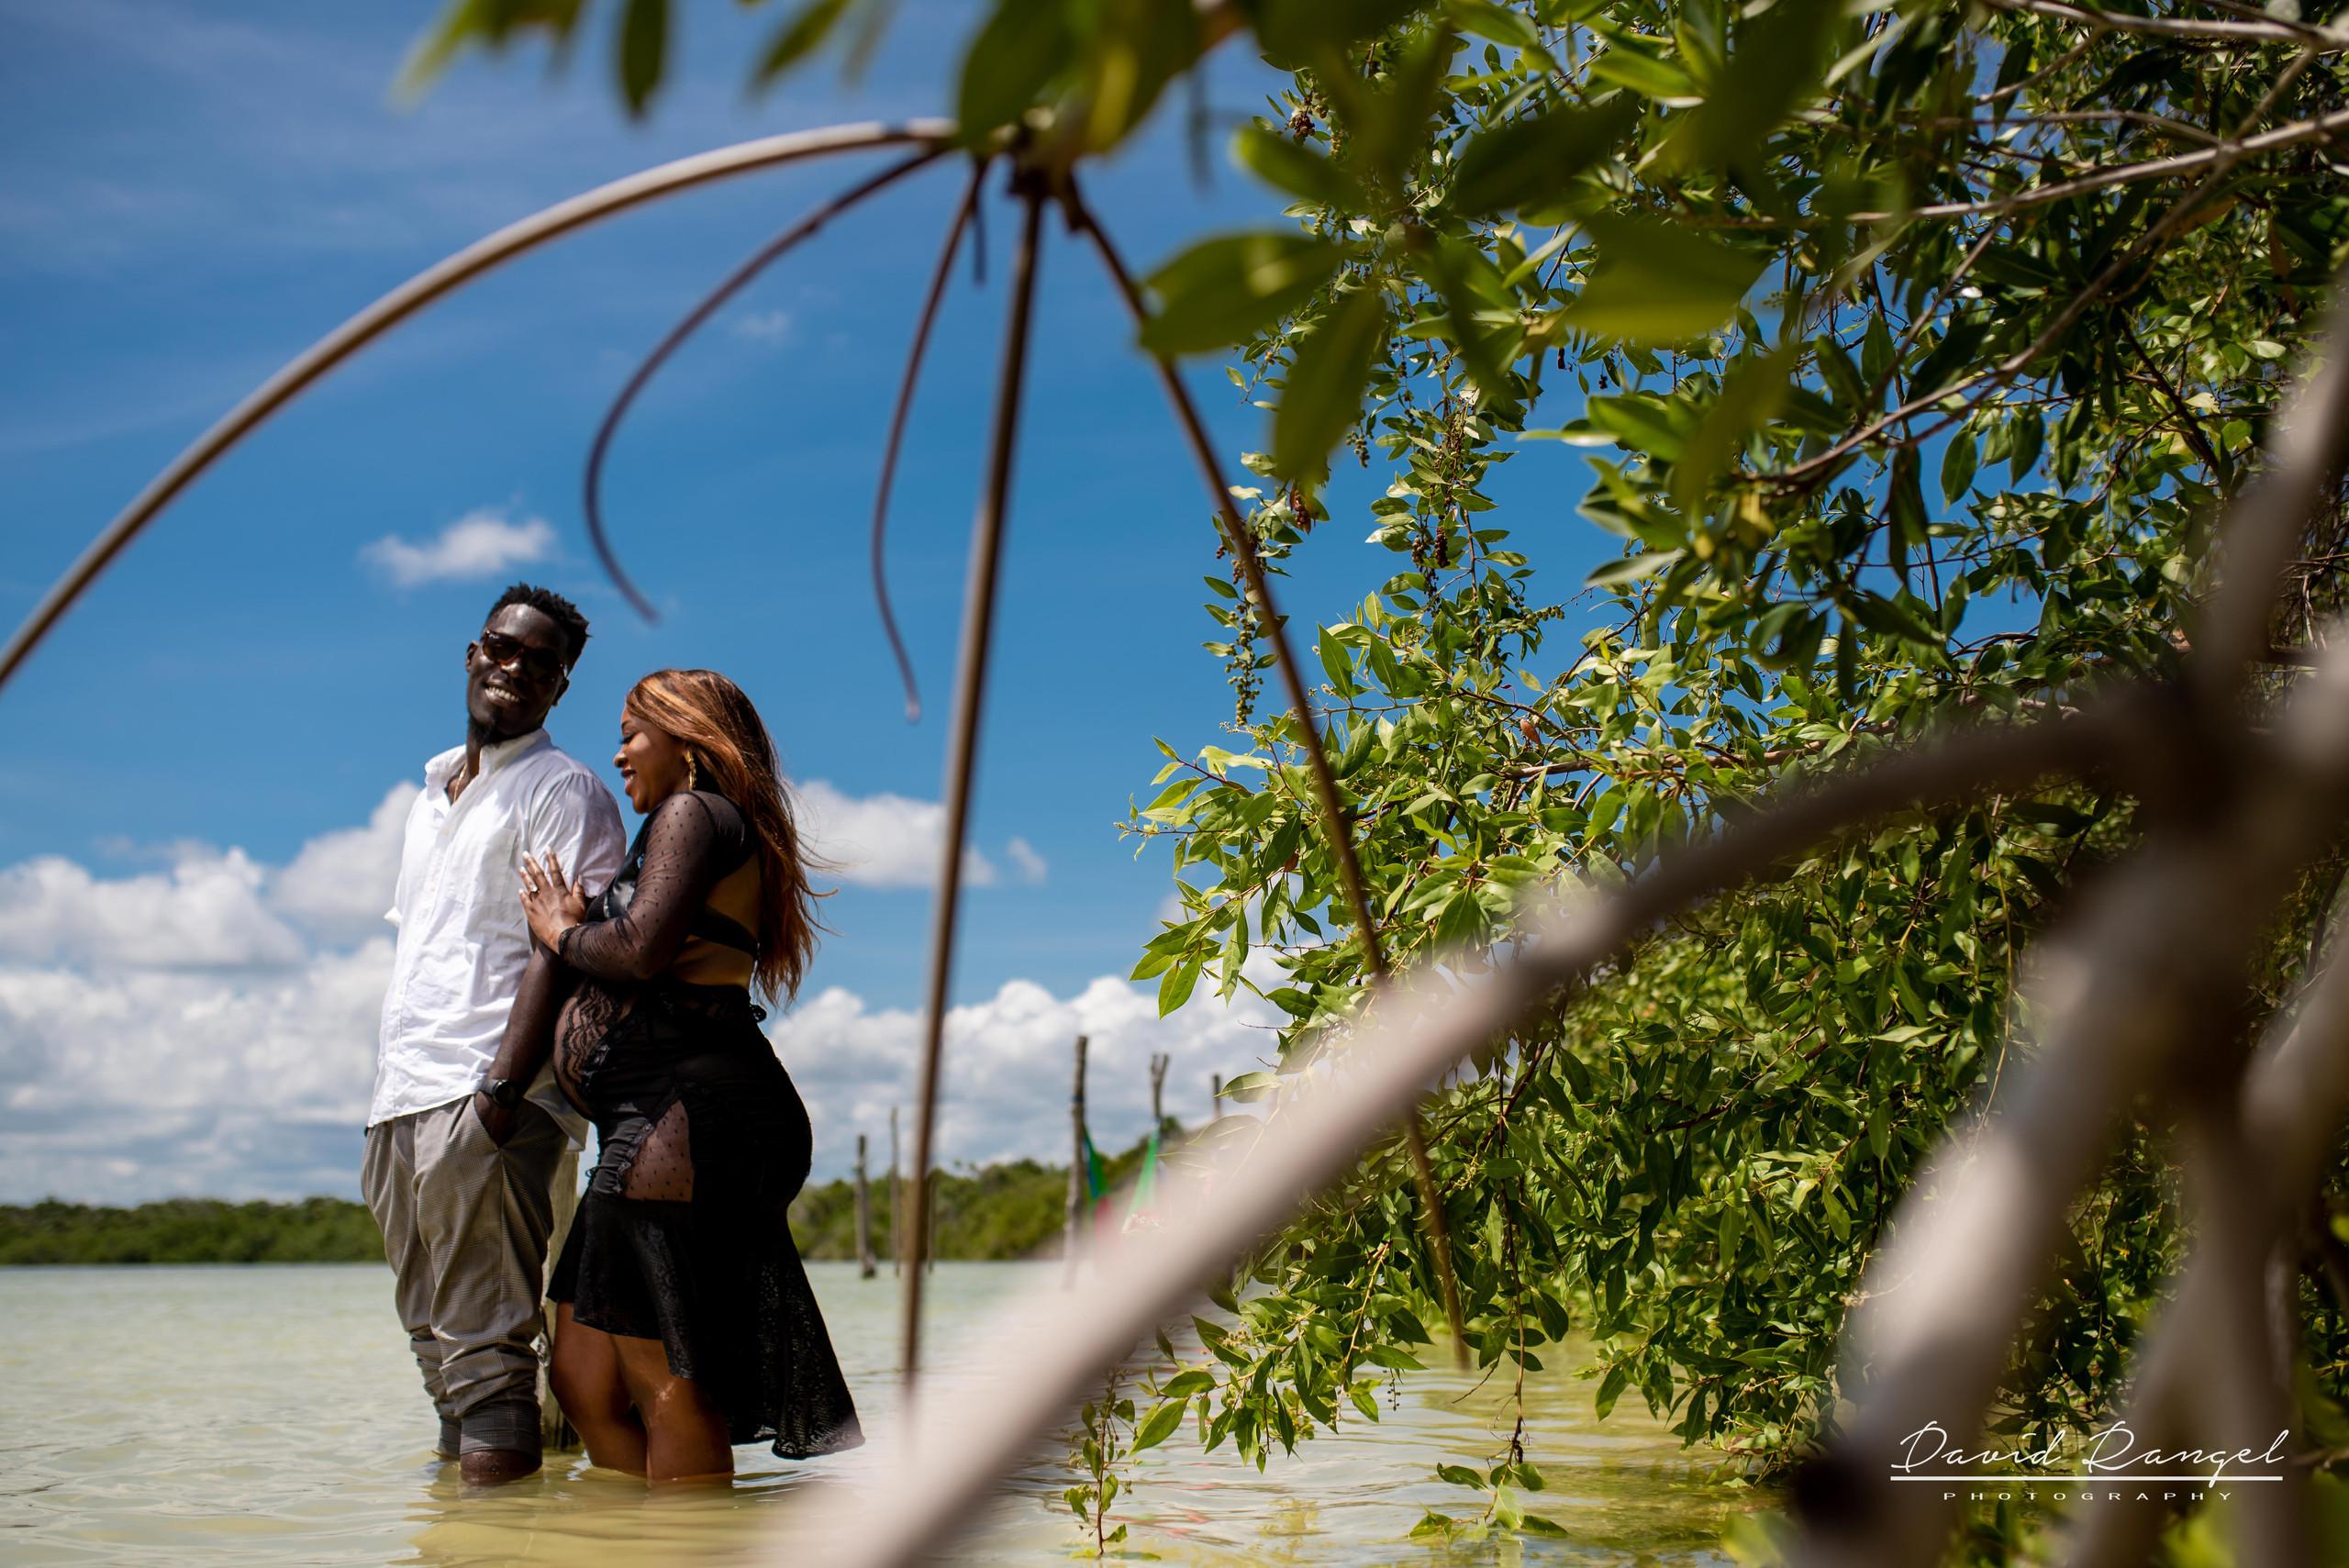 maternity+pregnancy+photo+session+photographer+photography+laguna+kaan+luum+tulum+riviera+maya+destination+photosession+nature+heart+pier+trees+woman+girl+momtobe+love+father+union+couple+candyshot+candy